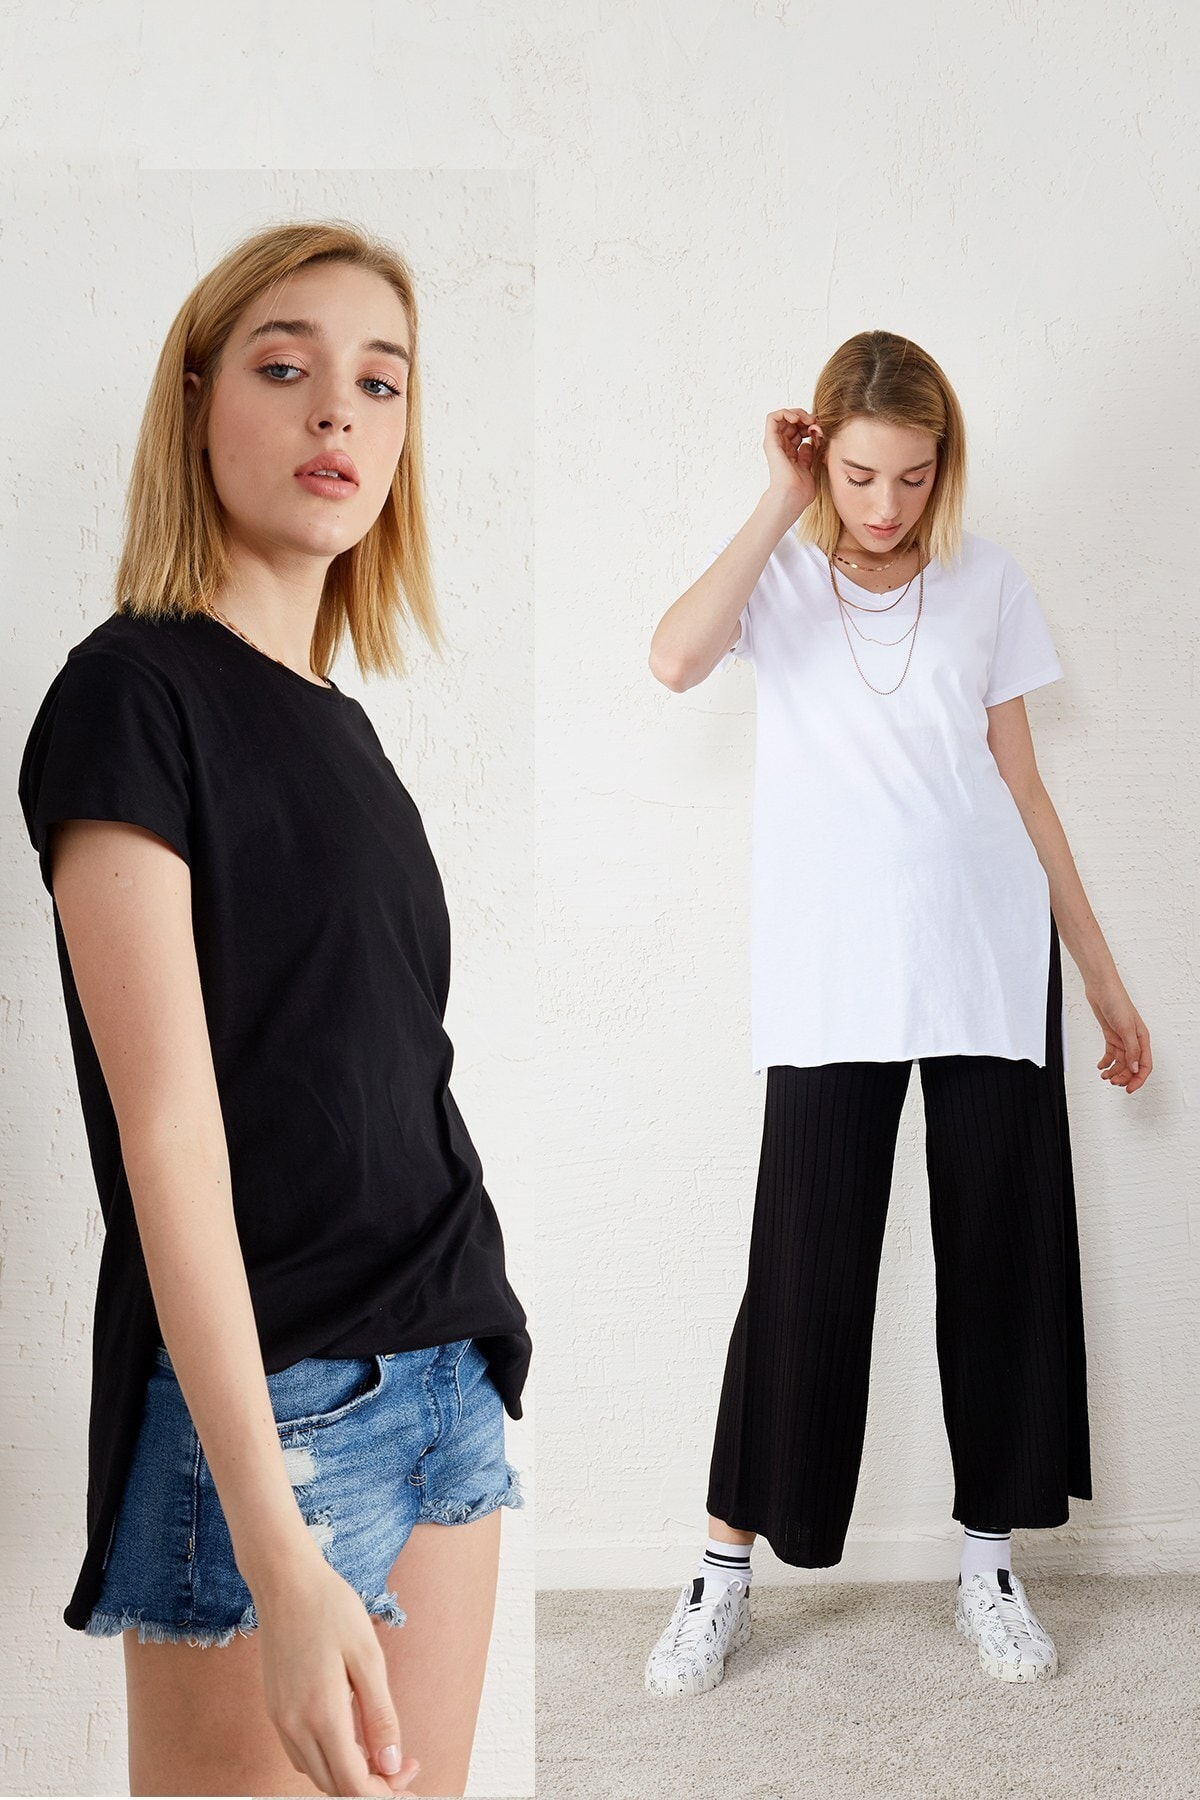 Eka Kadın Siyah - Beyaz 2'li Paket V Yaka Kısa Kol Yırtmaçlı T-shirt 1